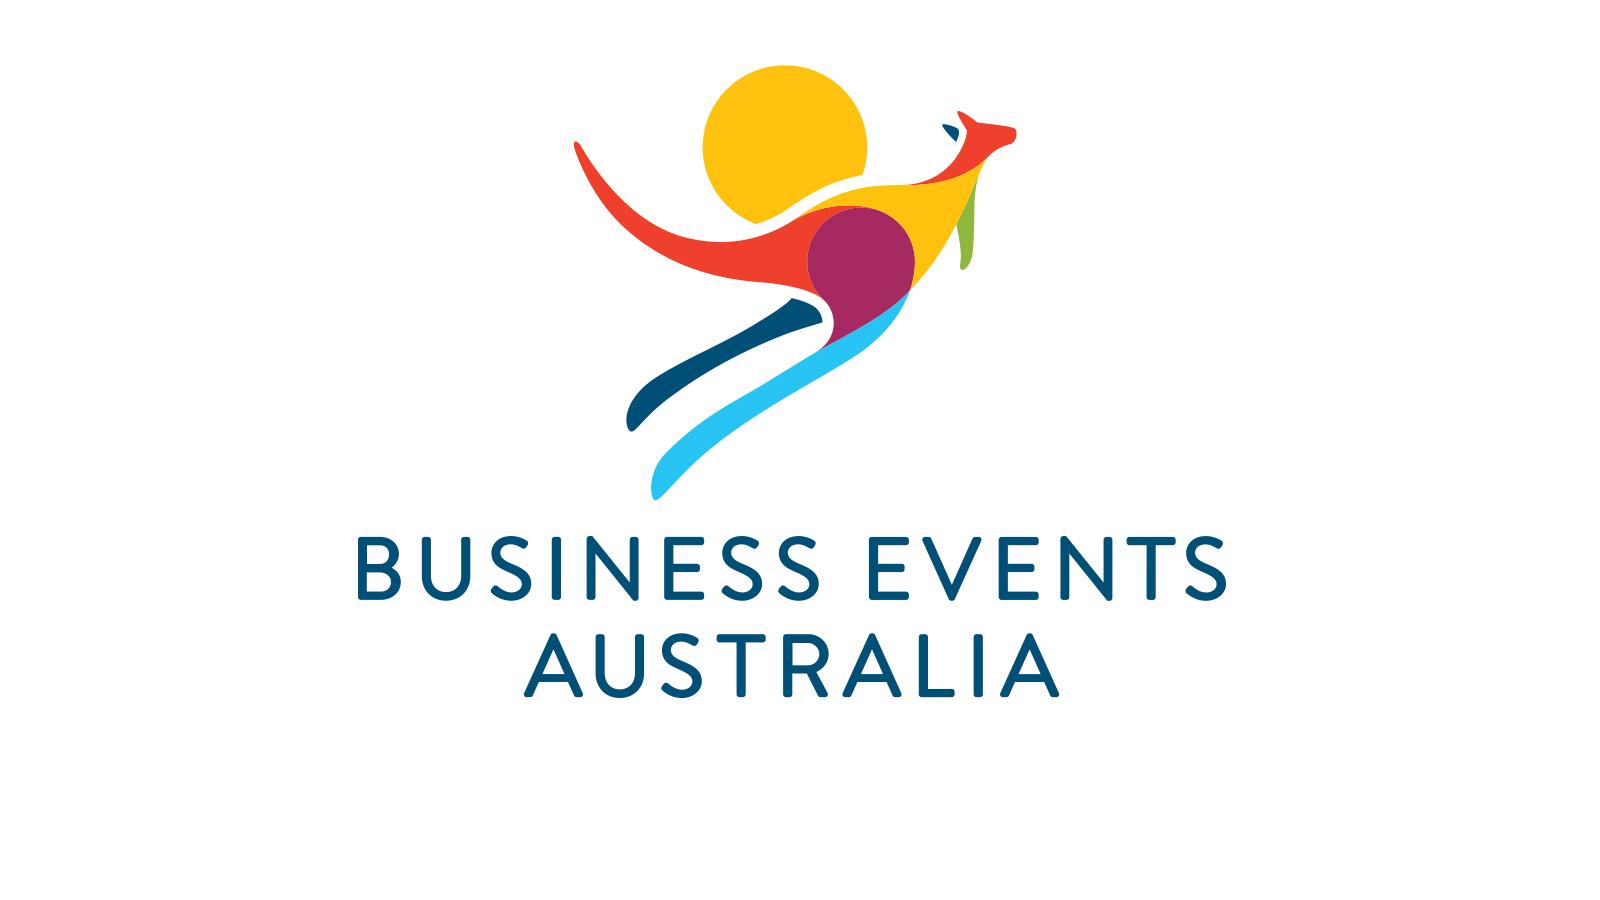 Business Events Australia